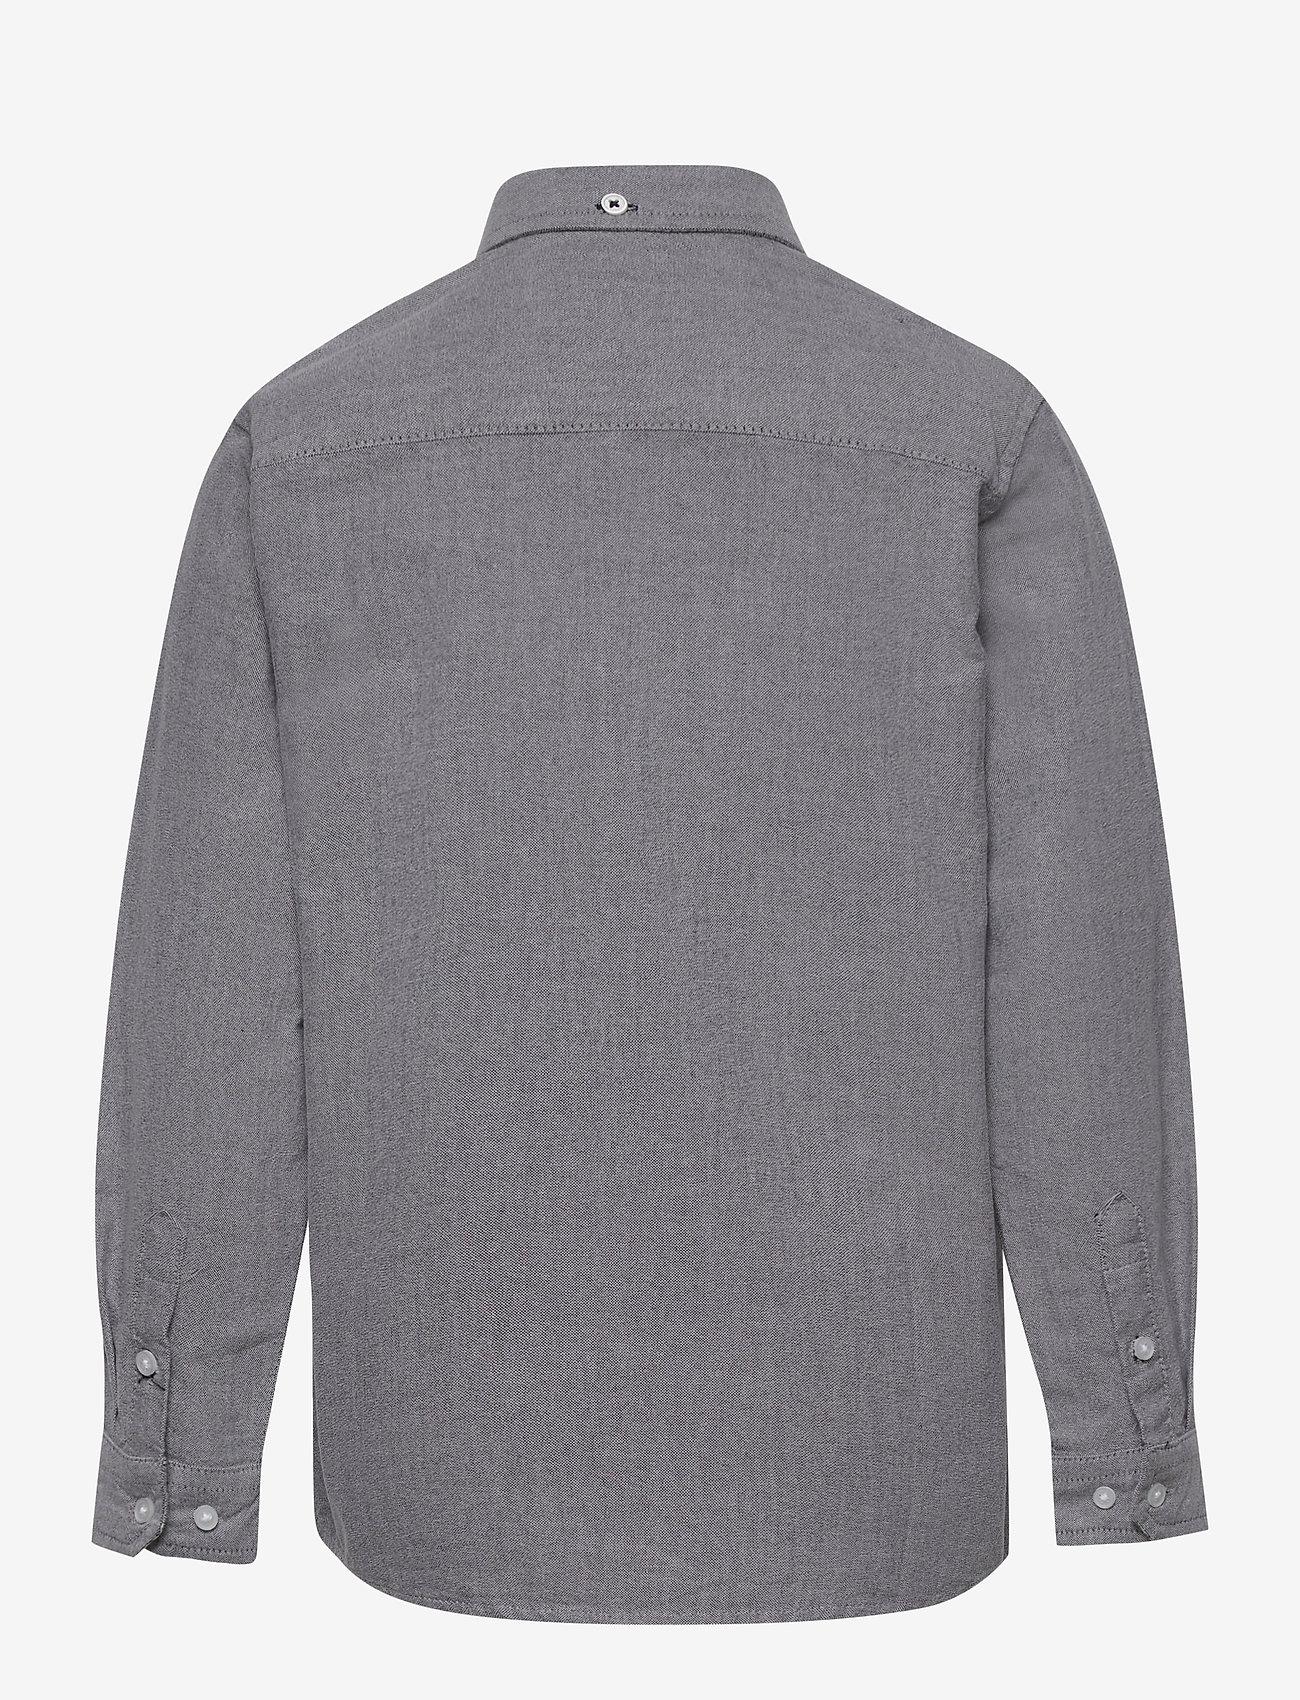 Kronstadt - Johan Oxford shirt - shirts - black - 1